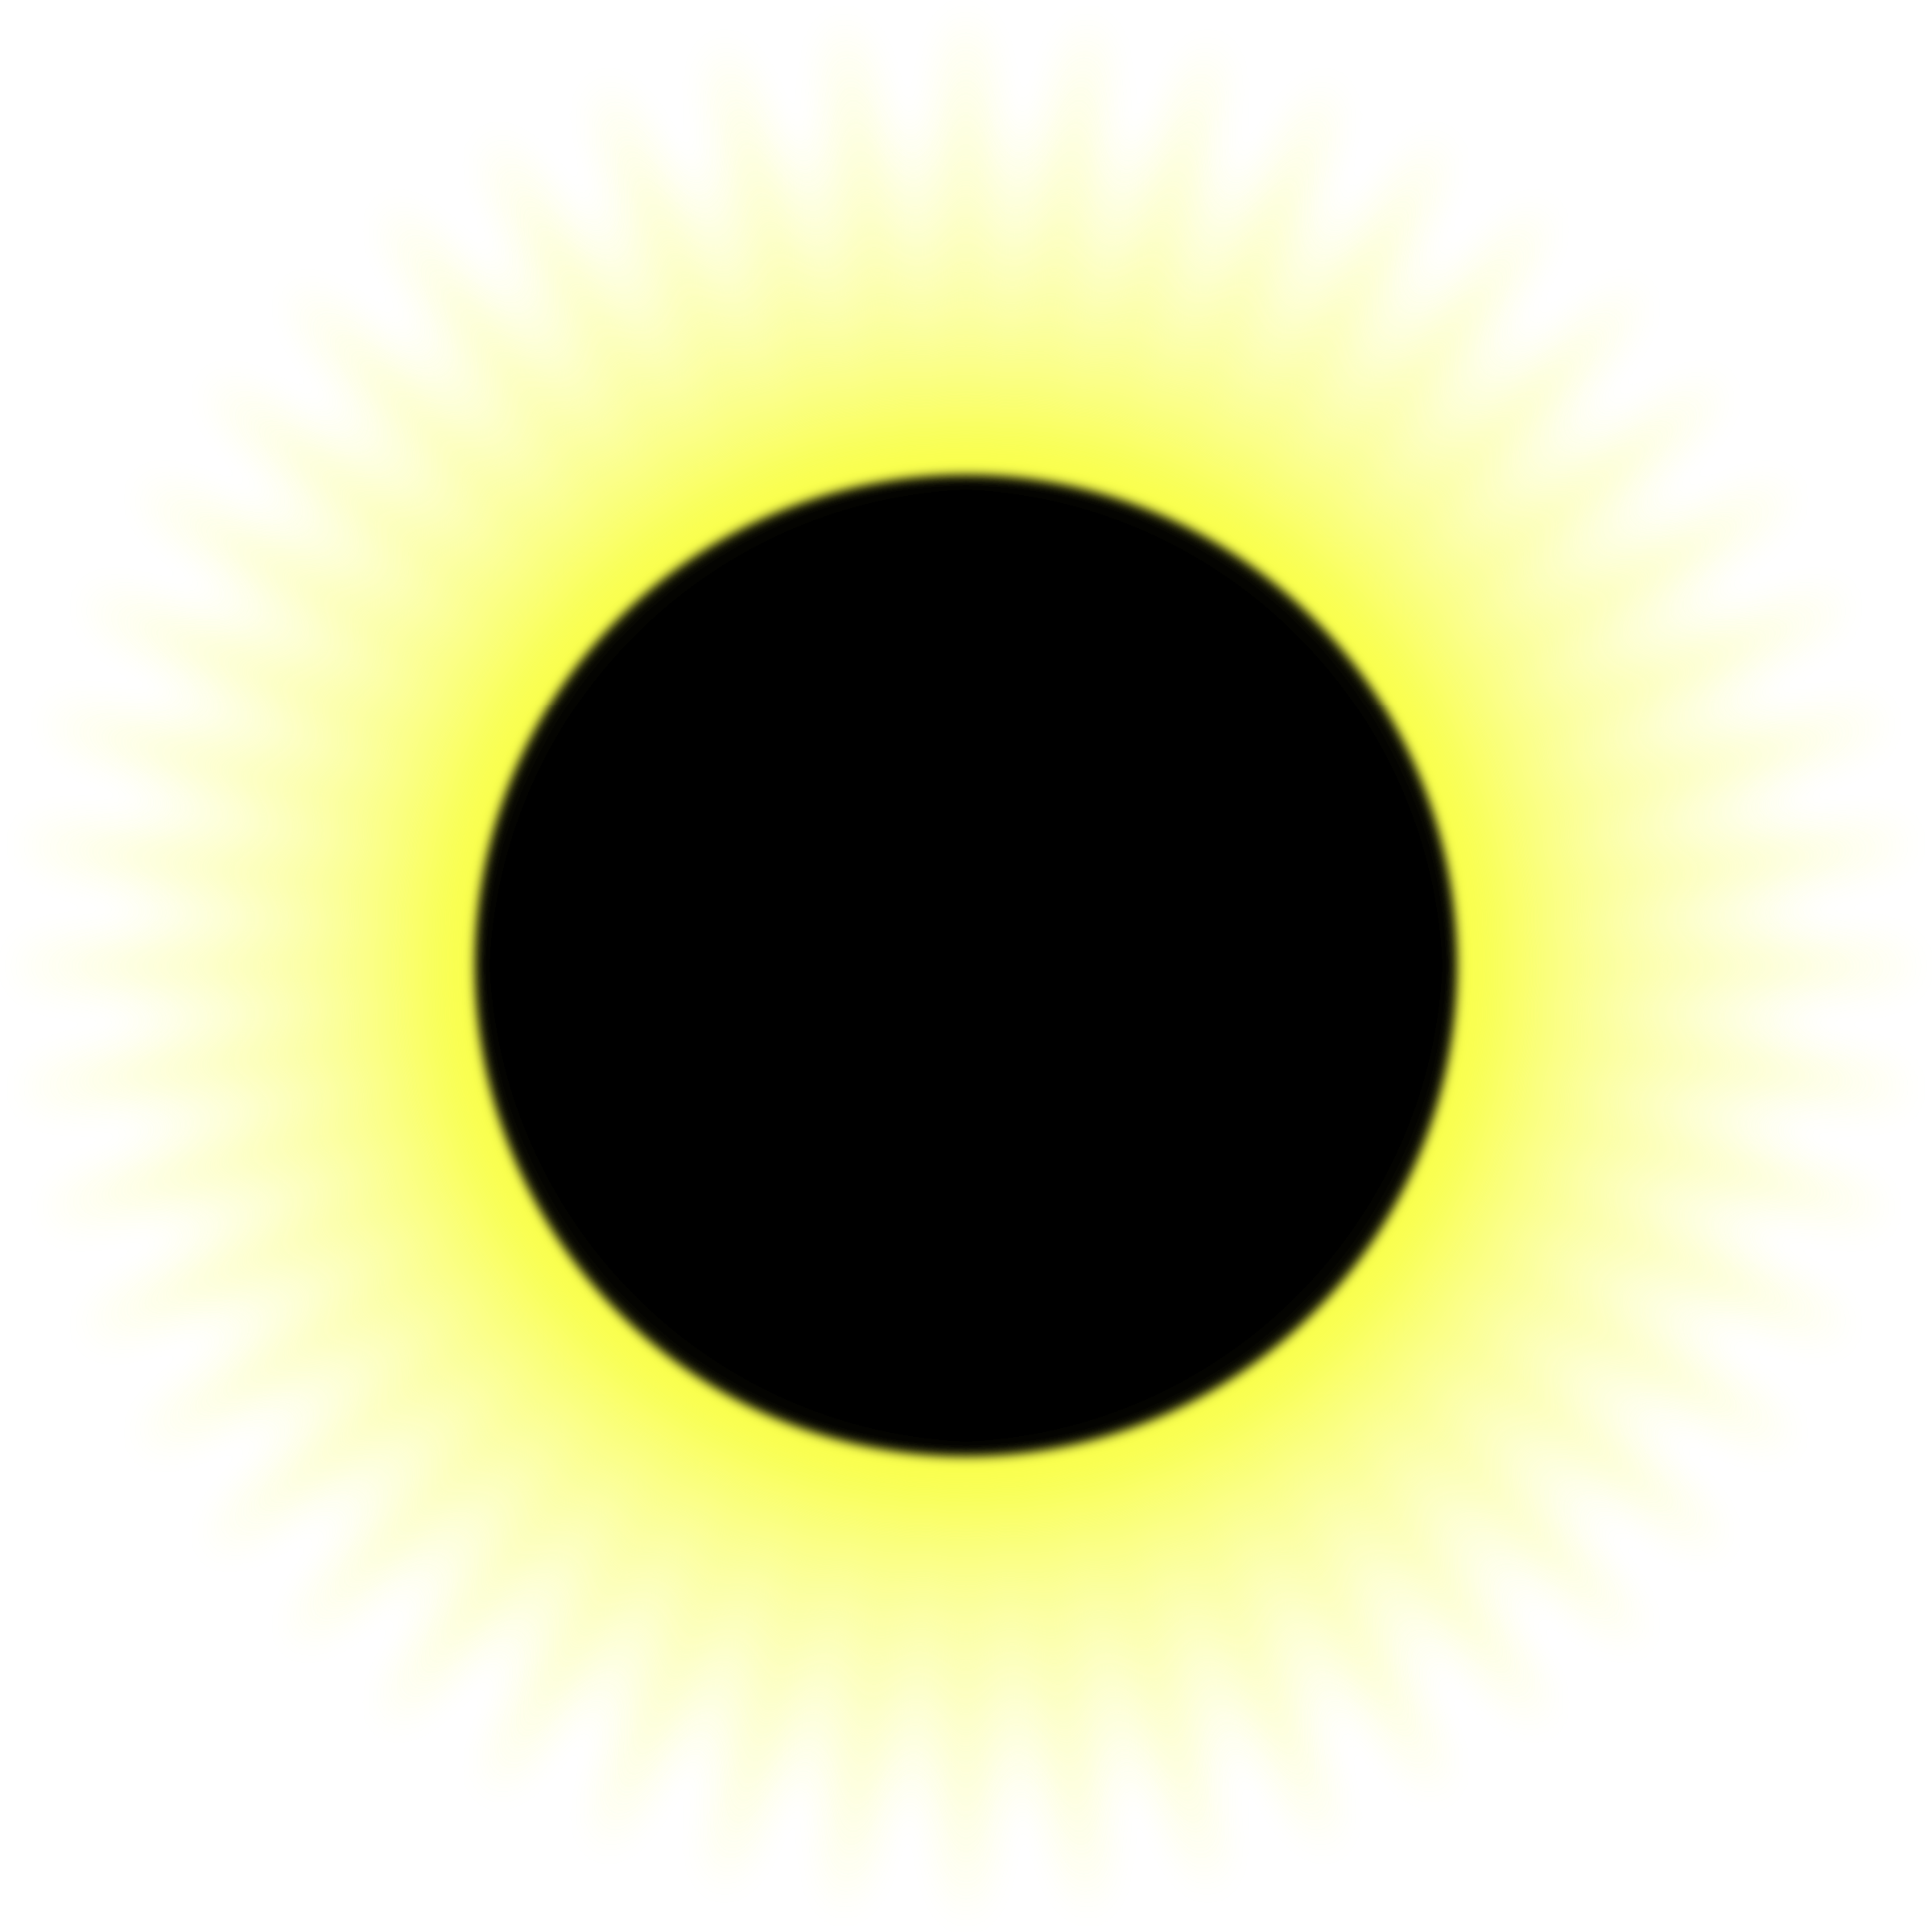 svg download Solar big image png. Eclipse clipart.